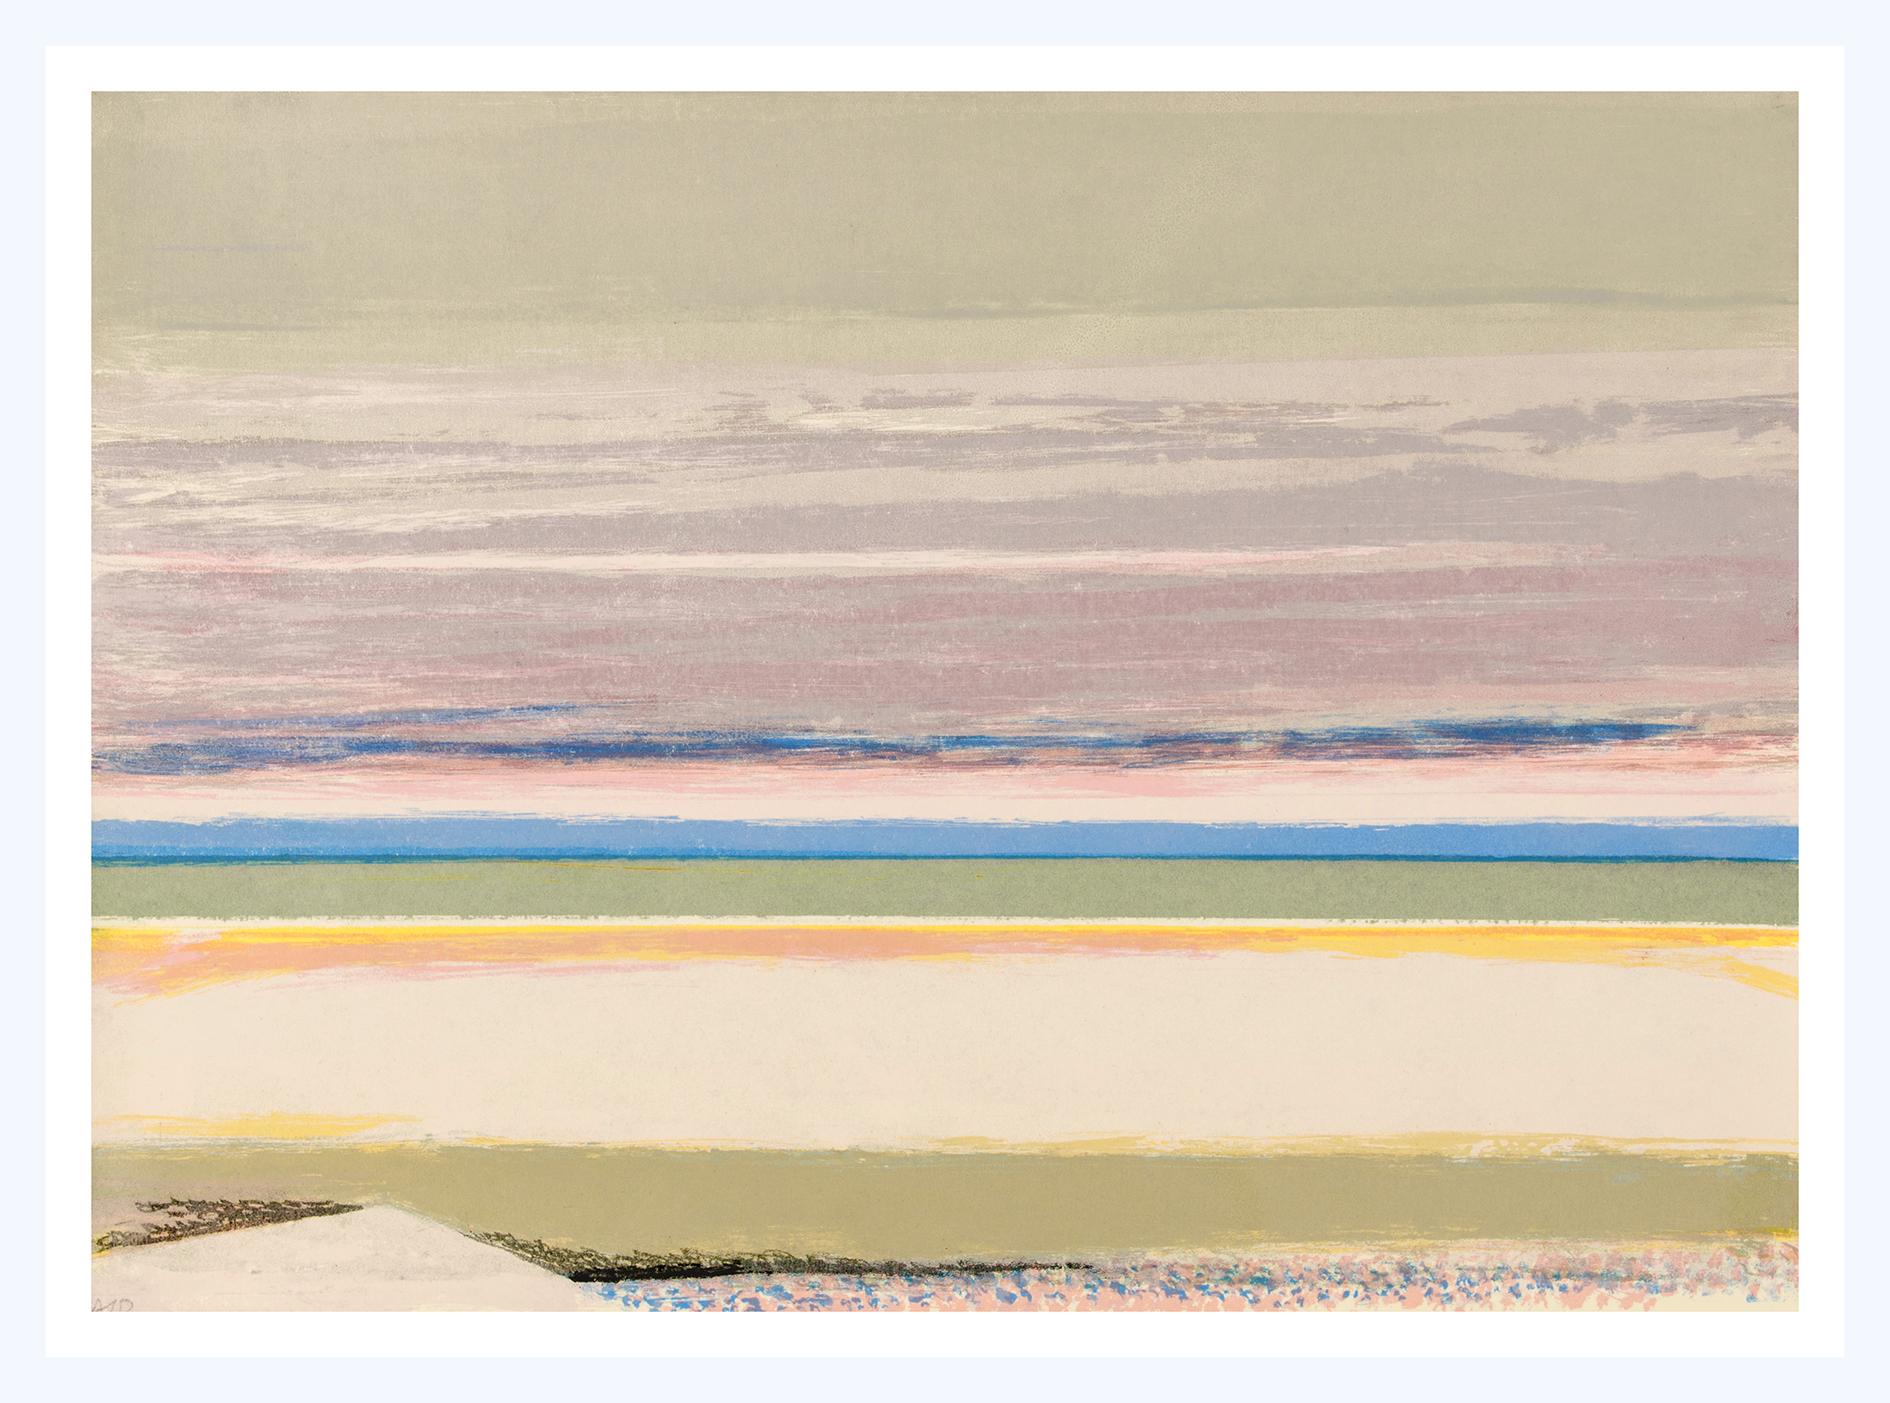 18 Shoreline, 38x52cm, screen print, ed of 5